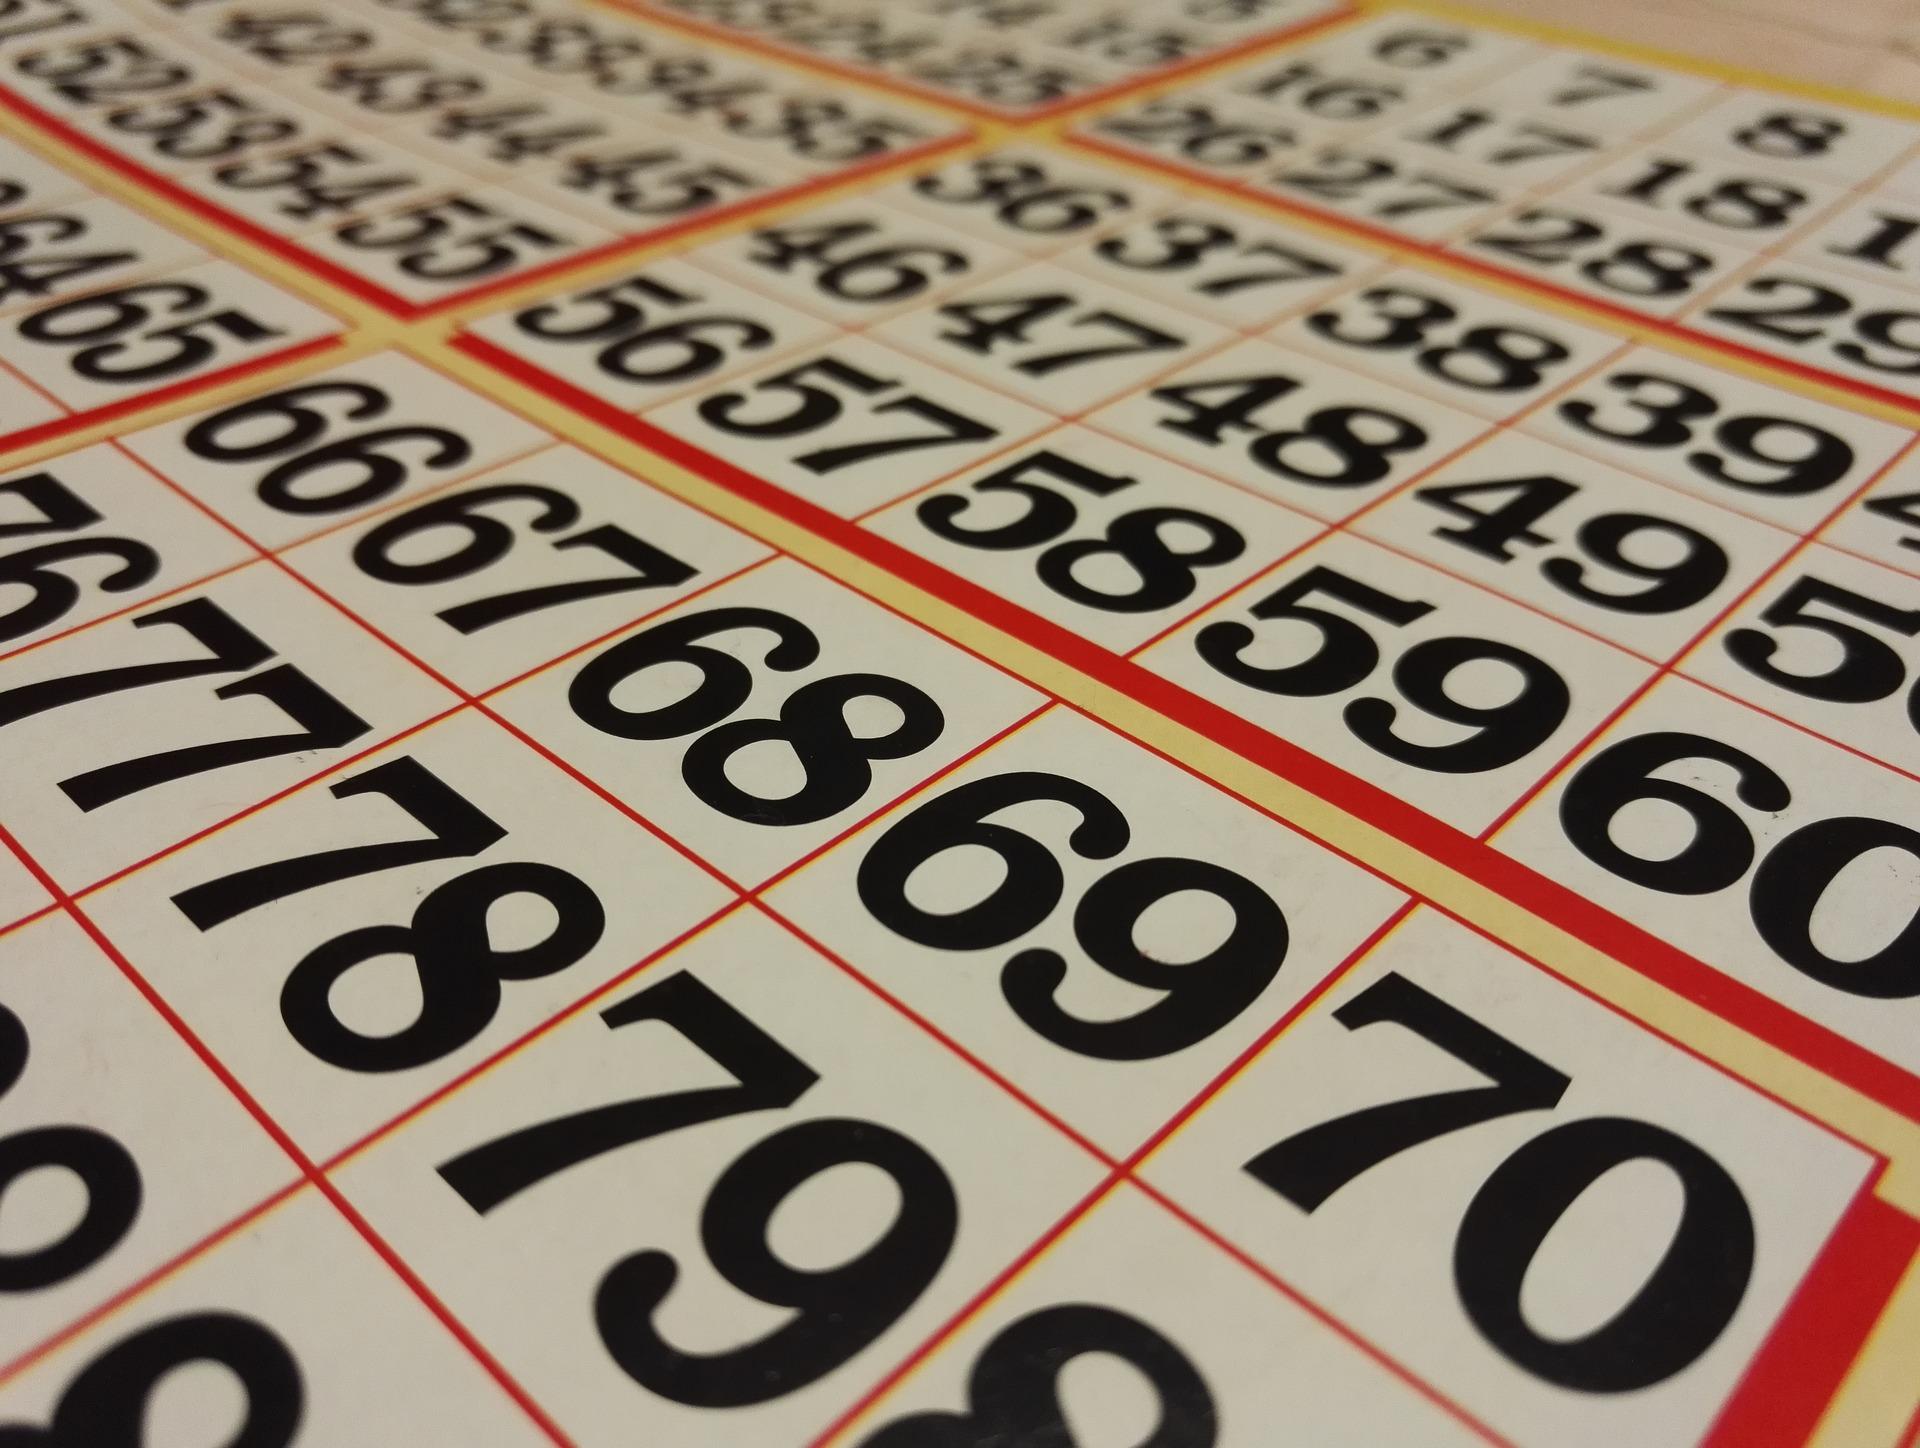 UK bingo operators warned to operate responsibly